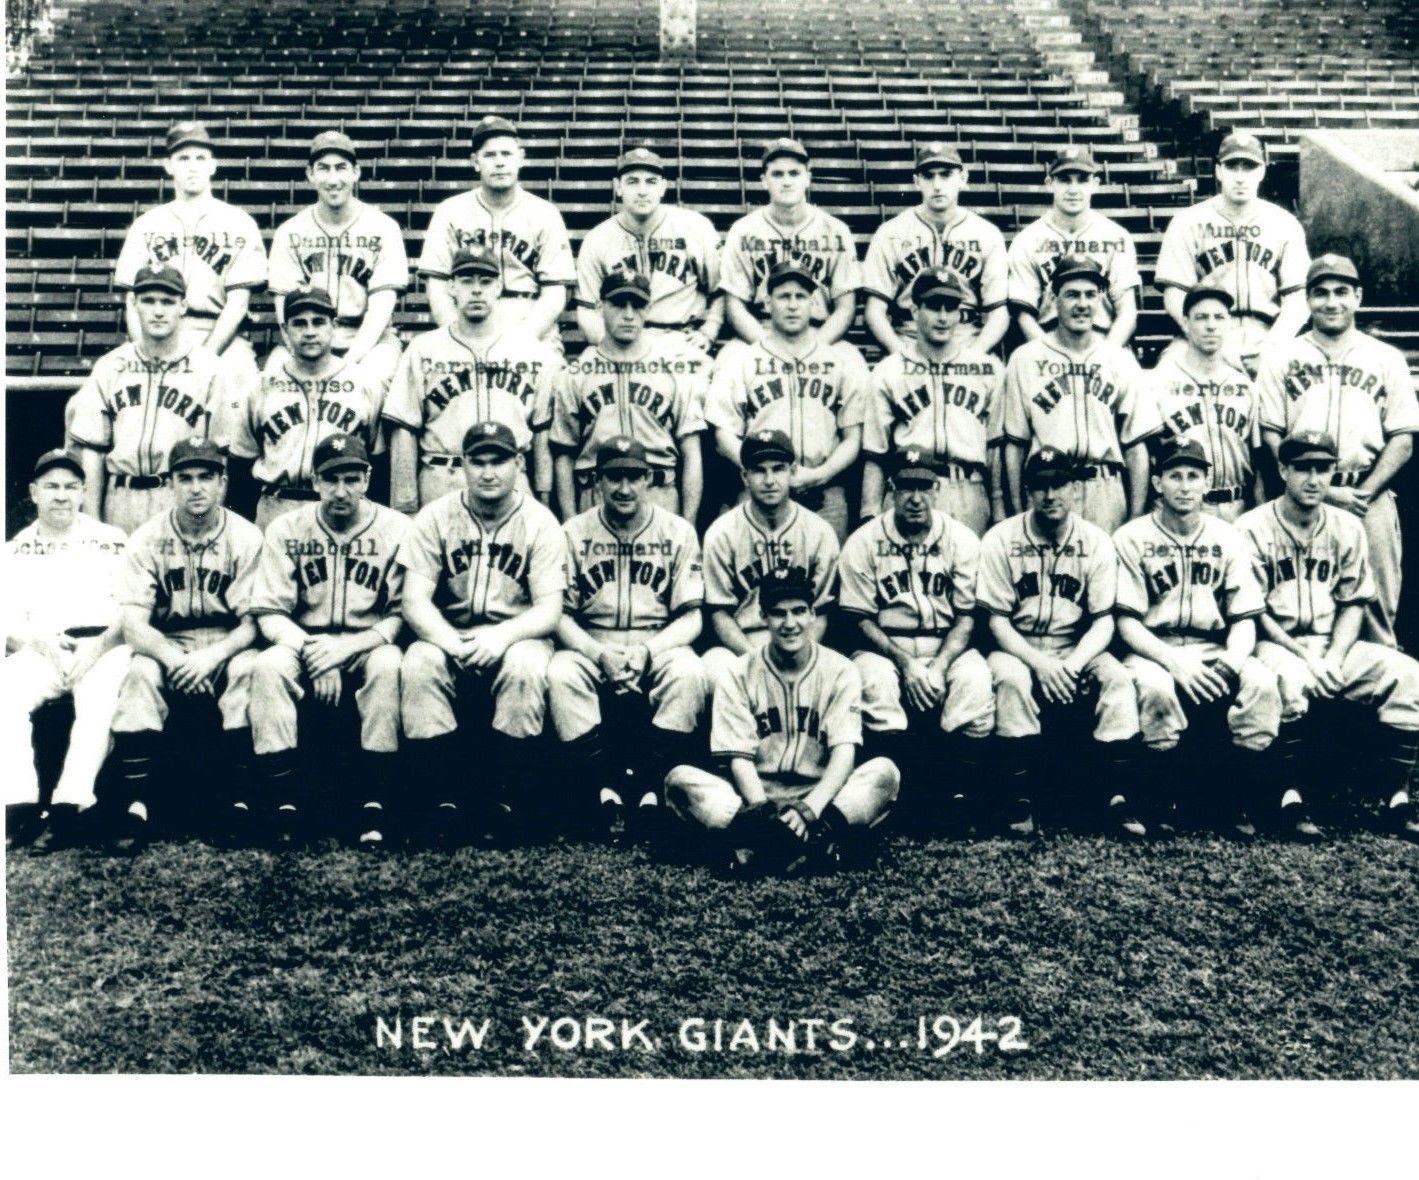 1942 NEW YORK GIANTS 8X10 TEAM PHOTO BASEBALL PICTURE NY MLB